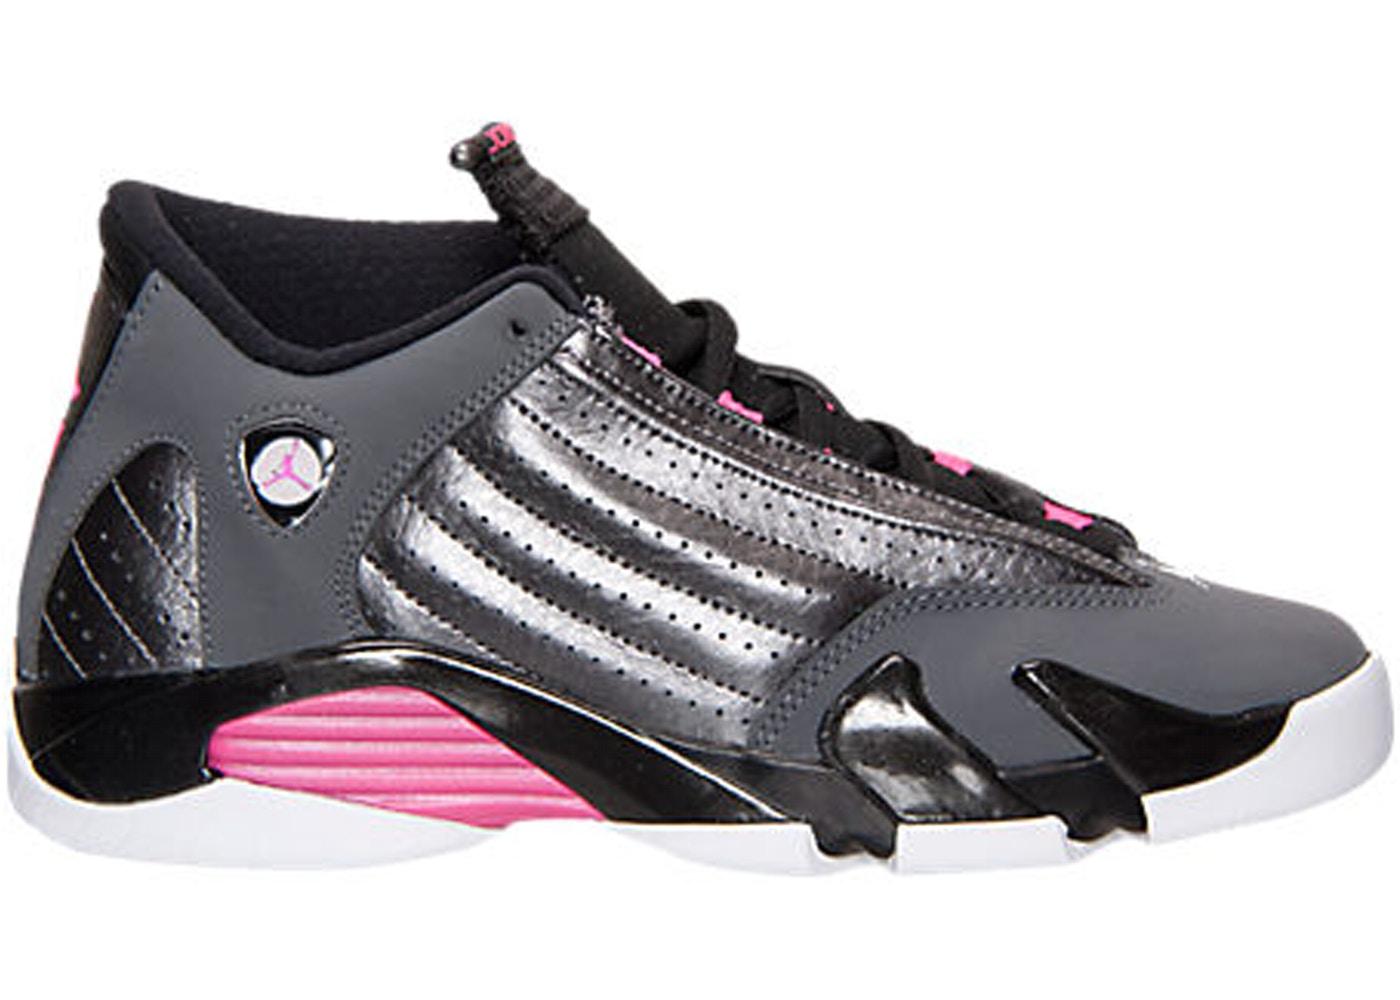 b713876f71c Jordan 14 Retro Hyper Pink (GS) - 654969-028